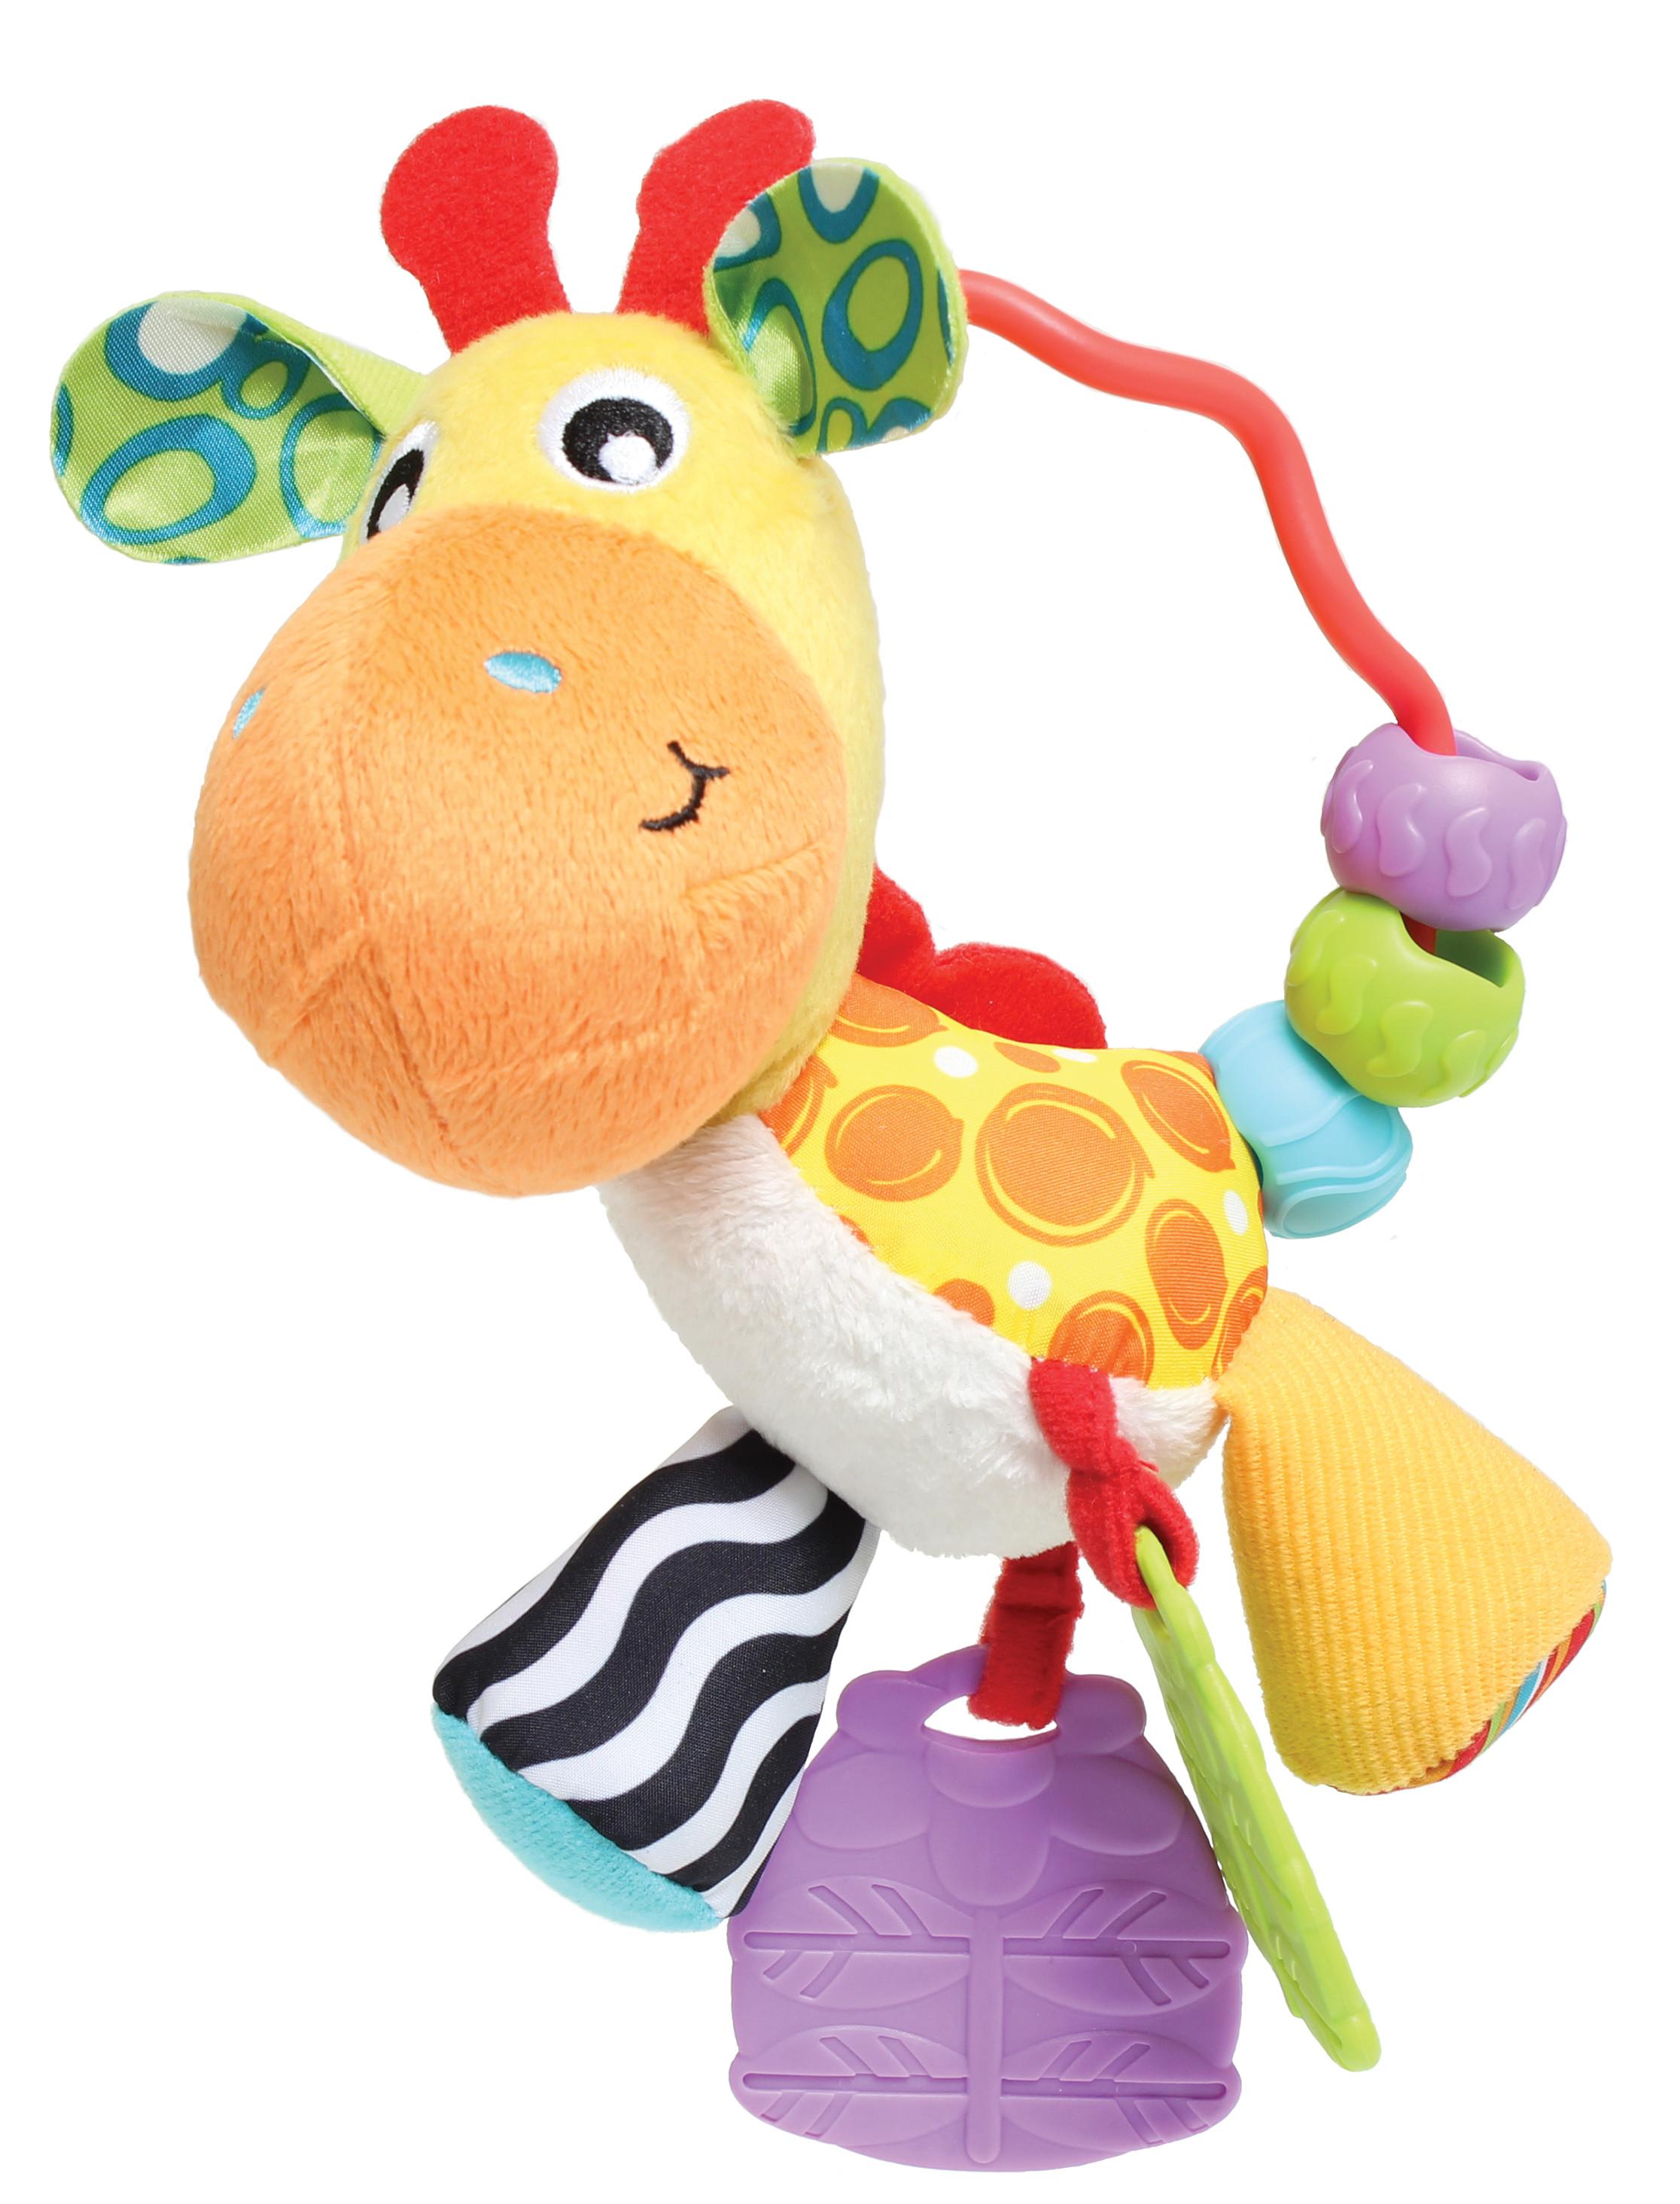 Купить Погремушка, Жираф, 1шт., Playgro 0186161, Китай, Мультиколор